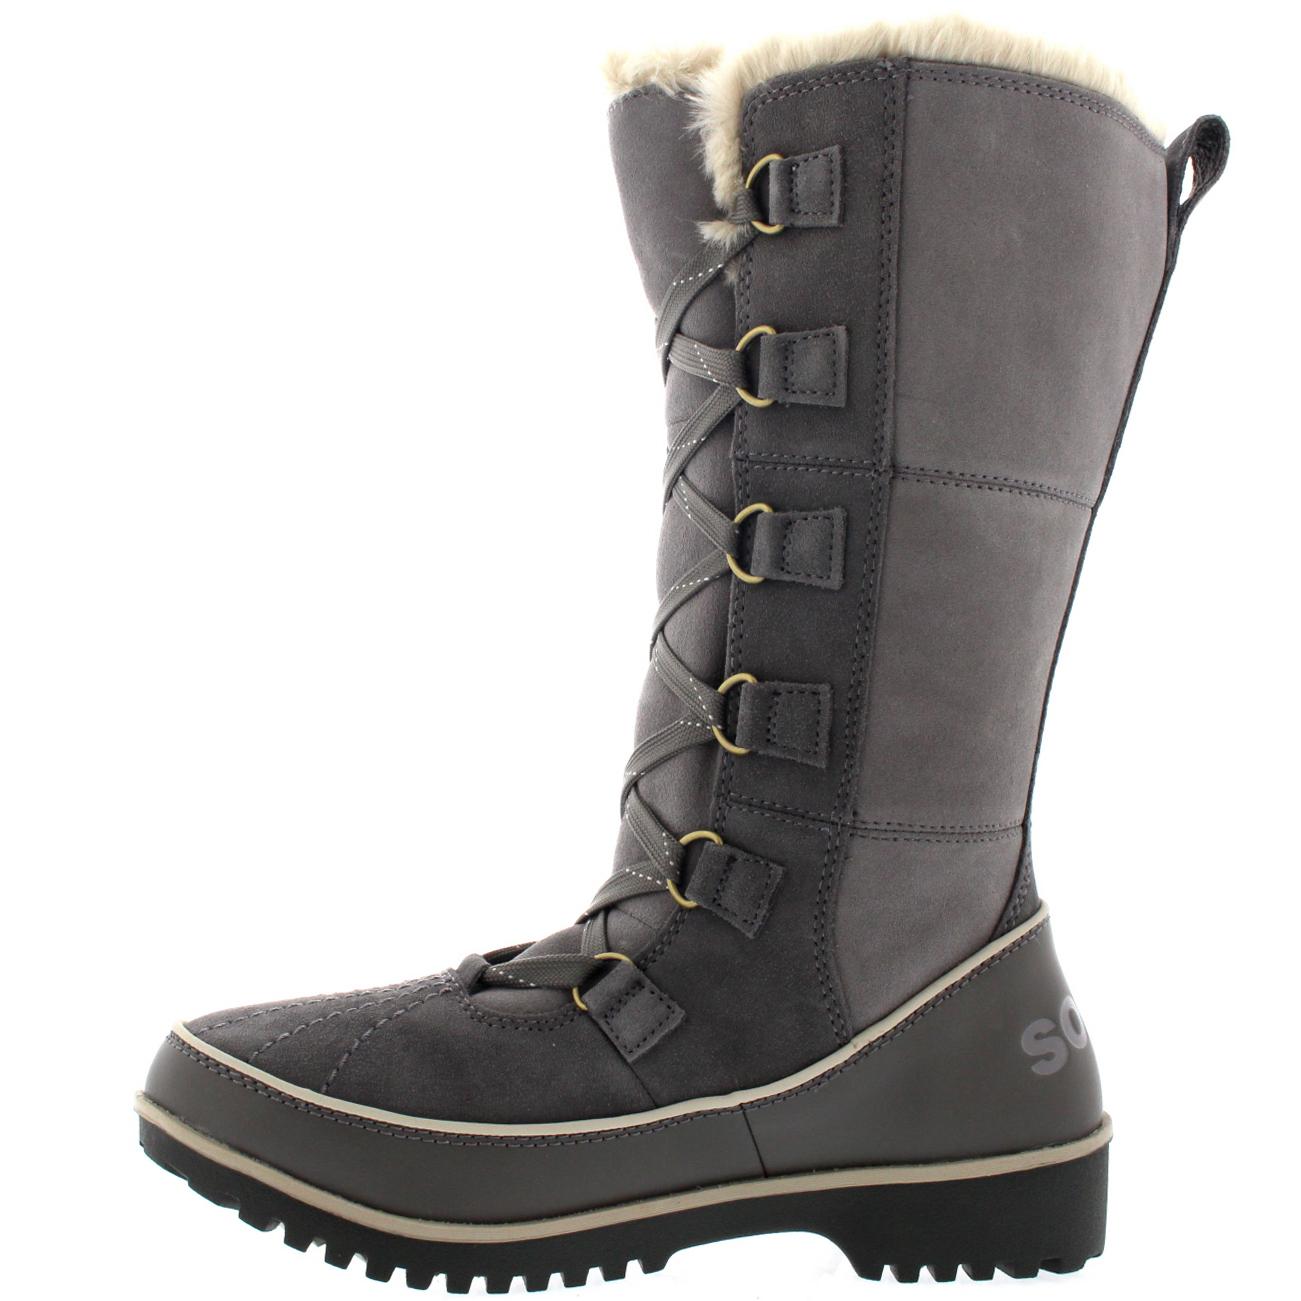 Kansas State Wildcats Ugg Boots